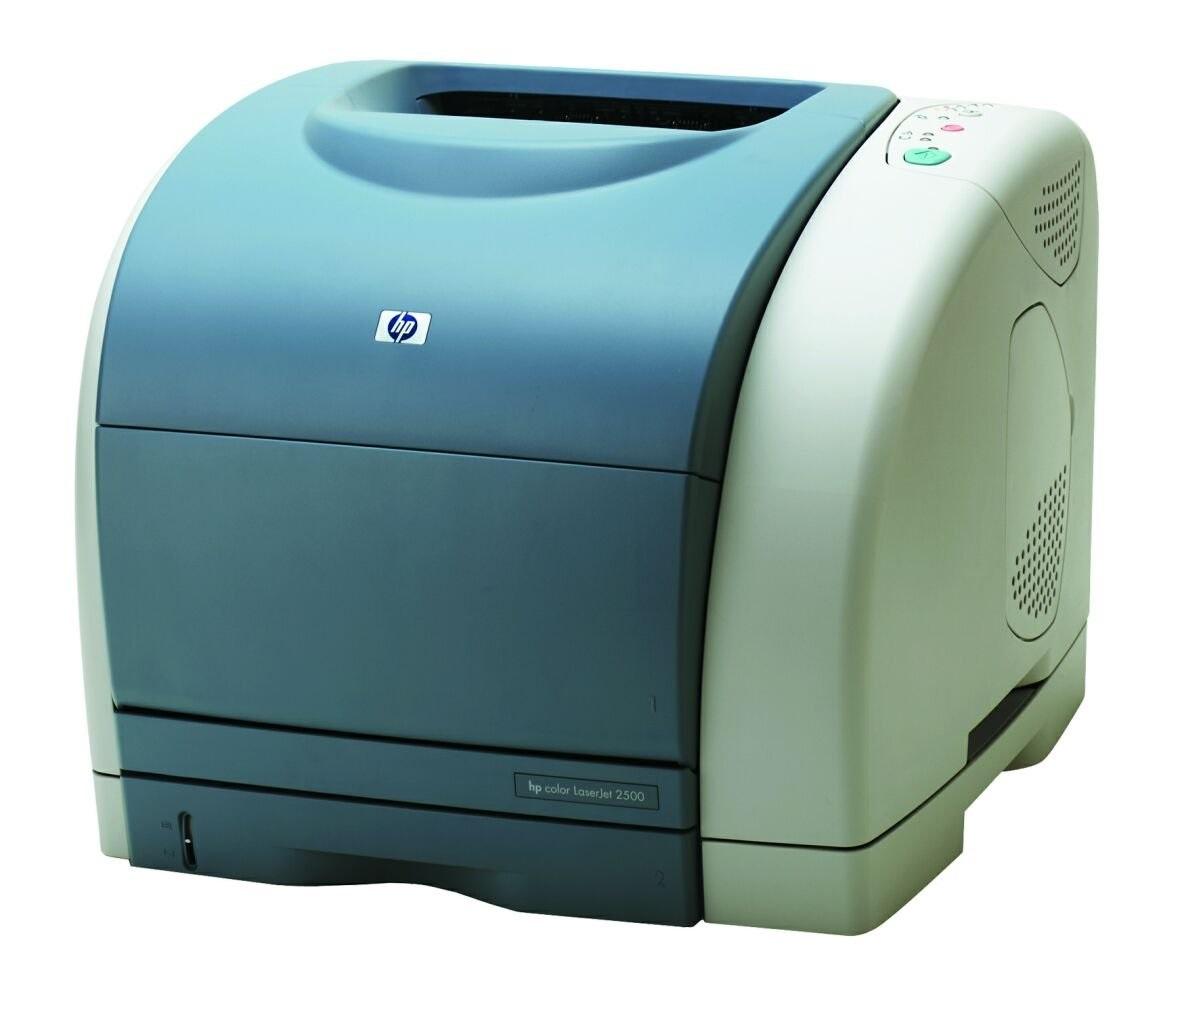 HP Color LaserJet 2500